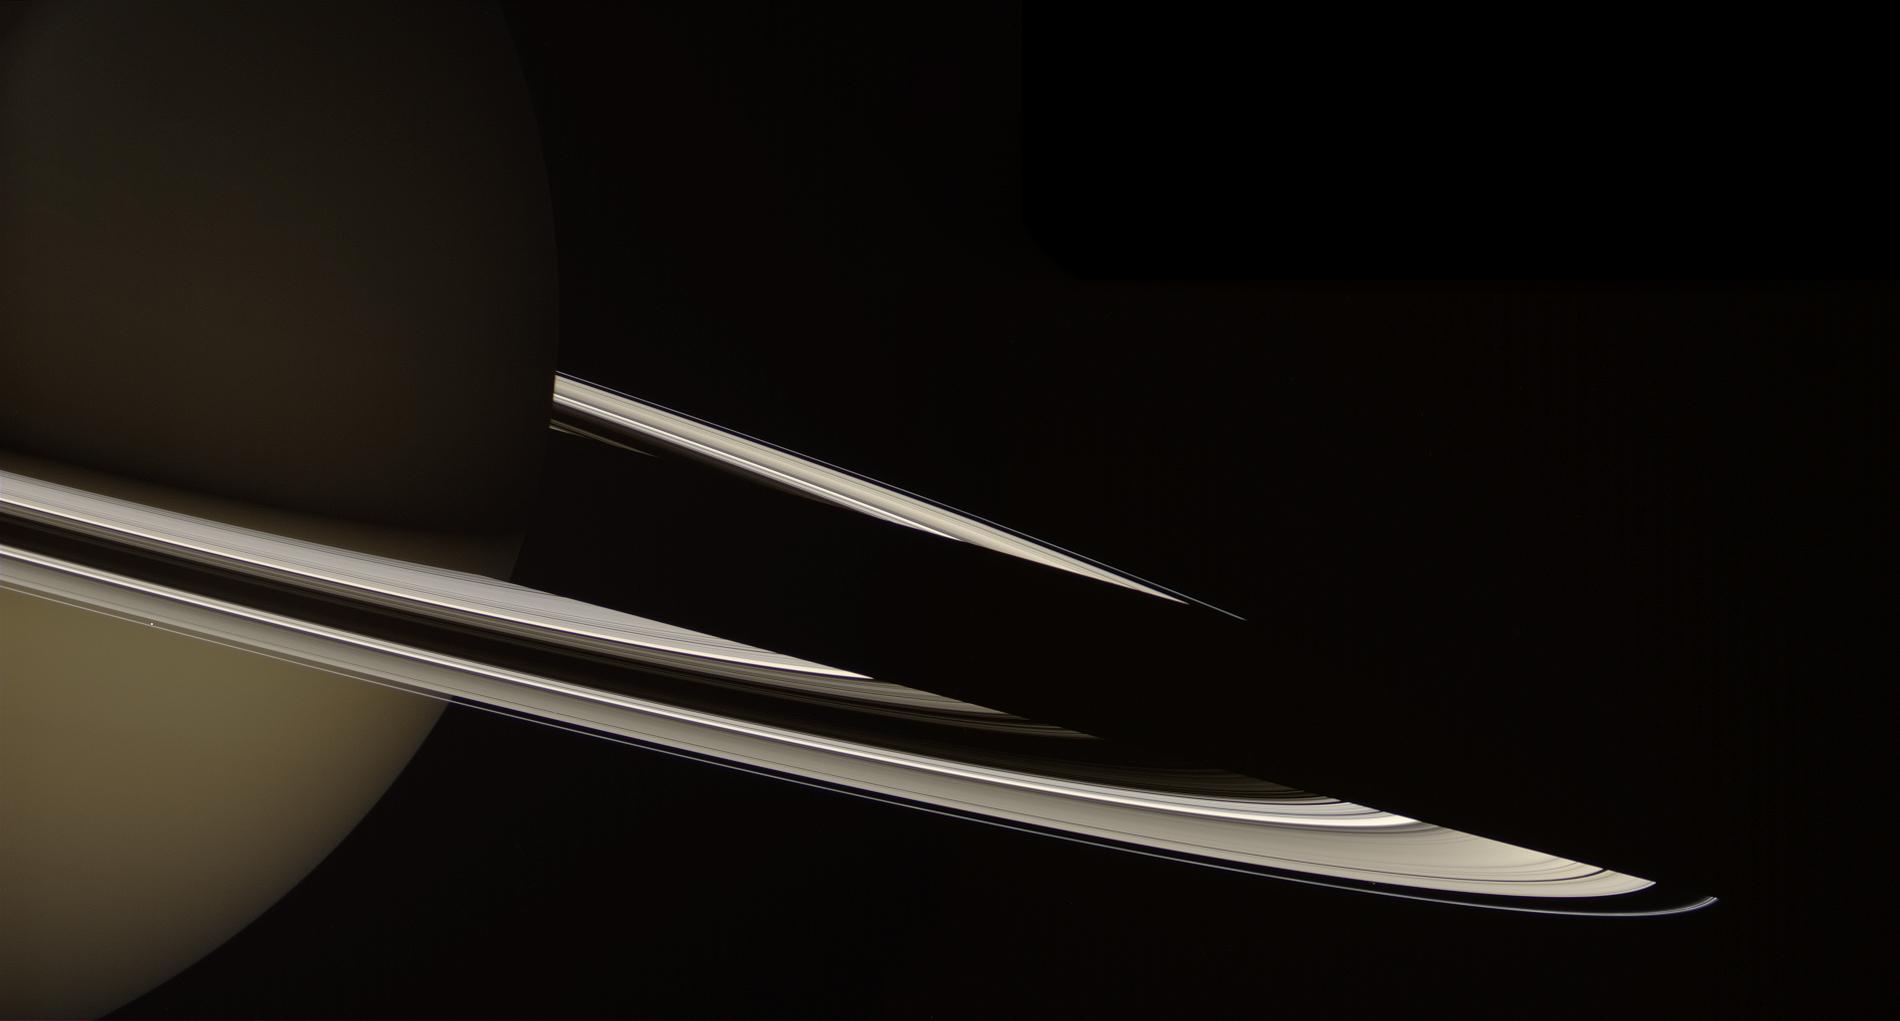 Saturn by Gordan Ugarkovic